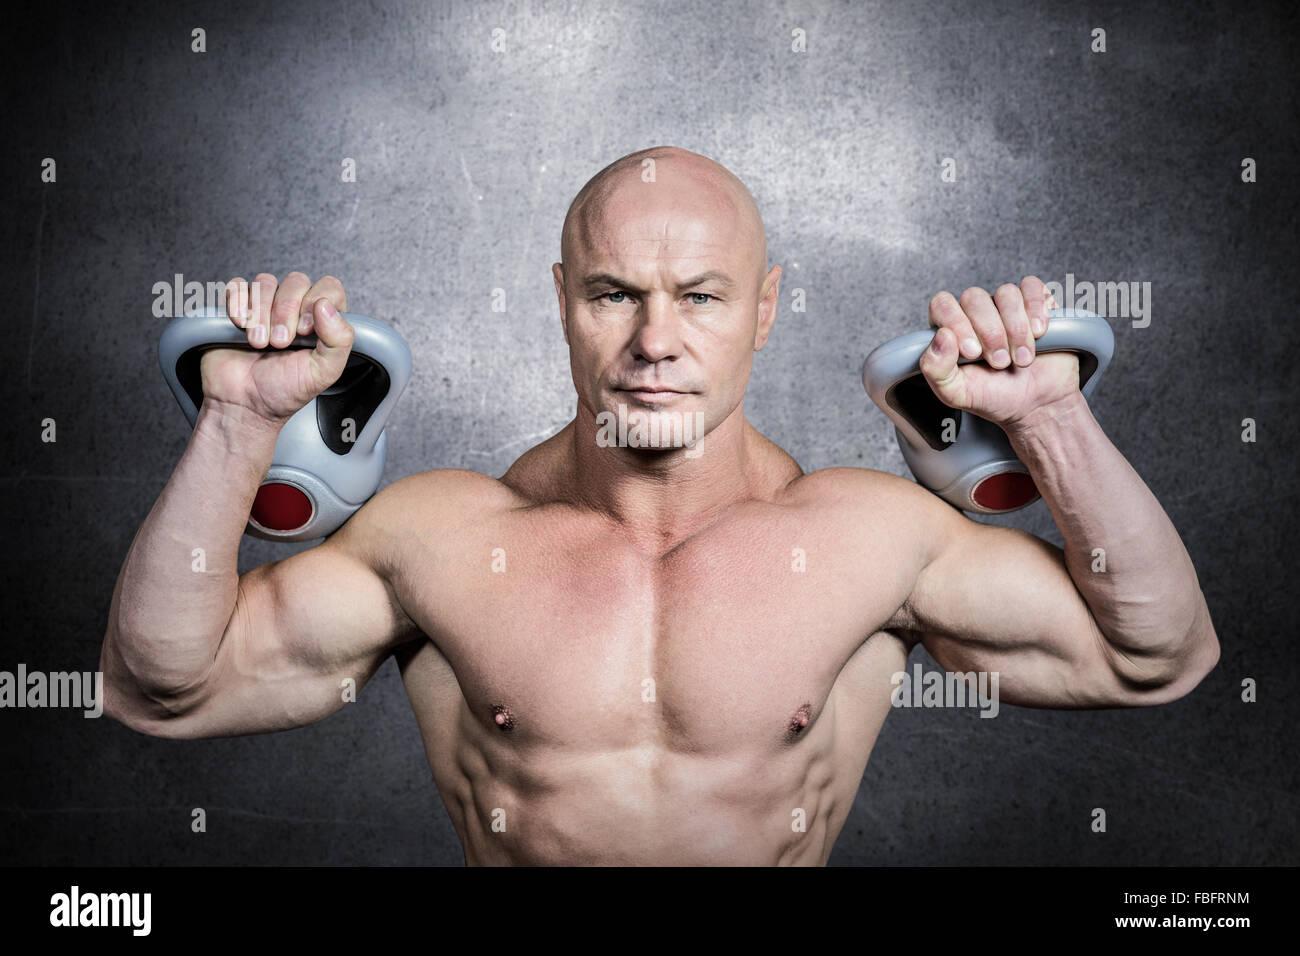 Composite image of portrait of bodybuilder lifting kettlebells - Stock Image